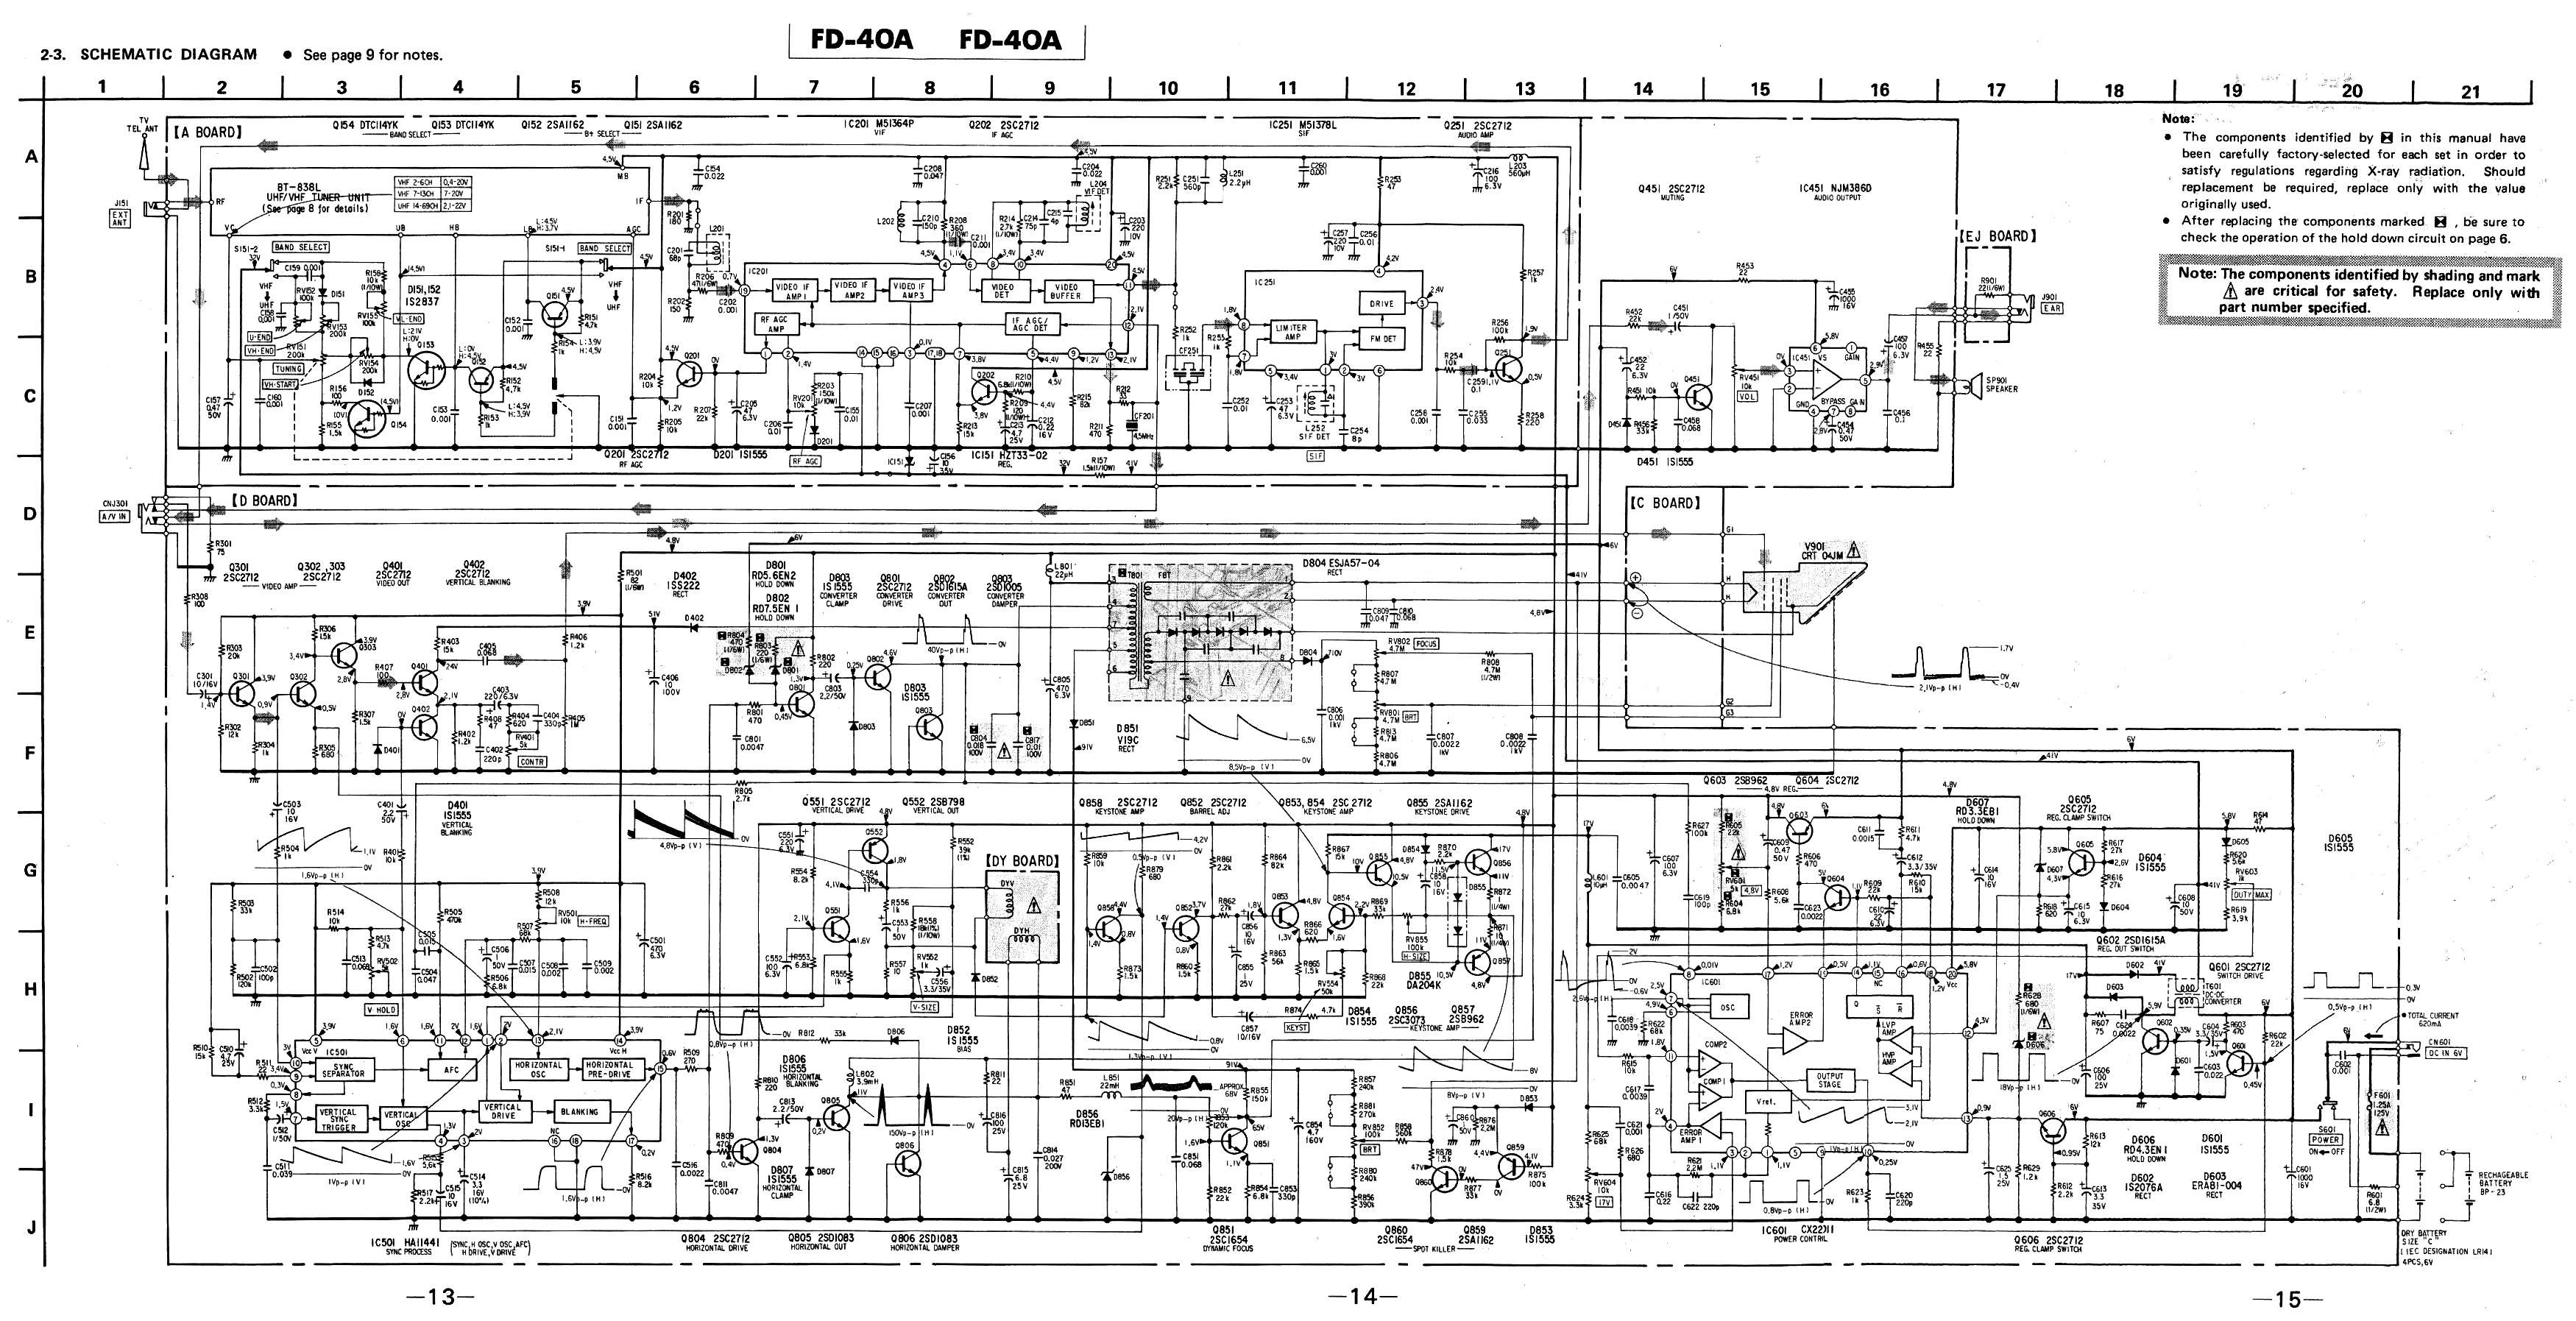 06 Hhr Fuse Diagram Great Design Of Wiring 2011 Wire Underhood Box 2006 Parts Chevy